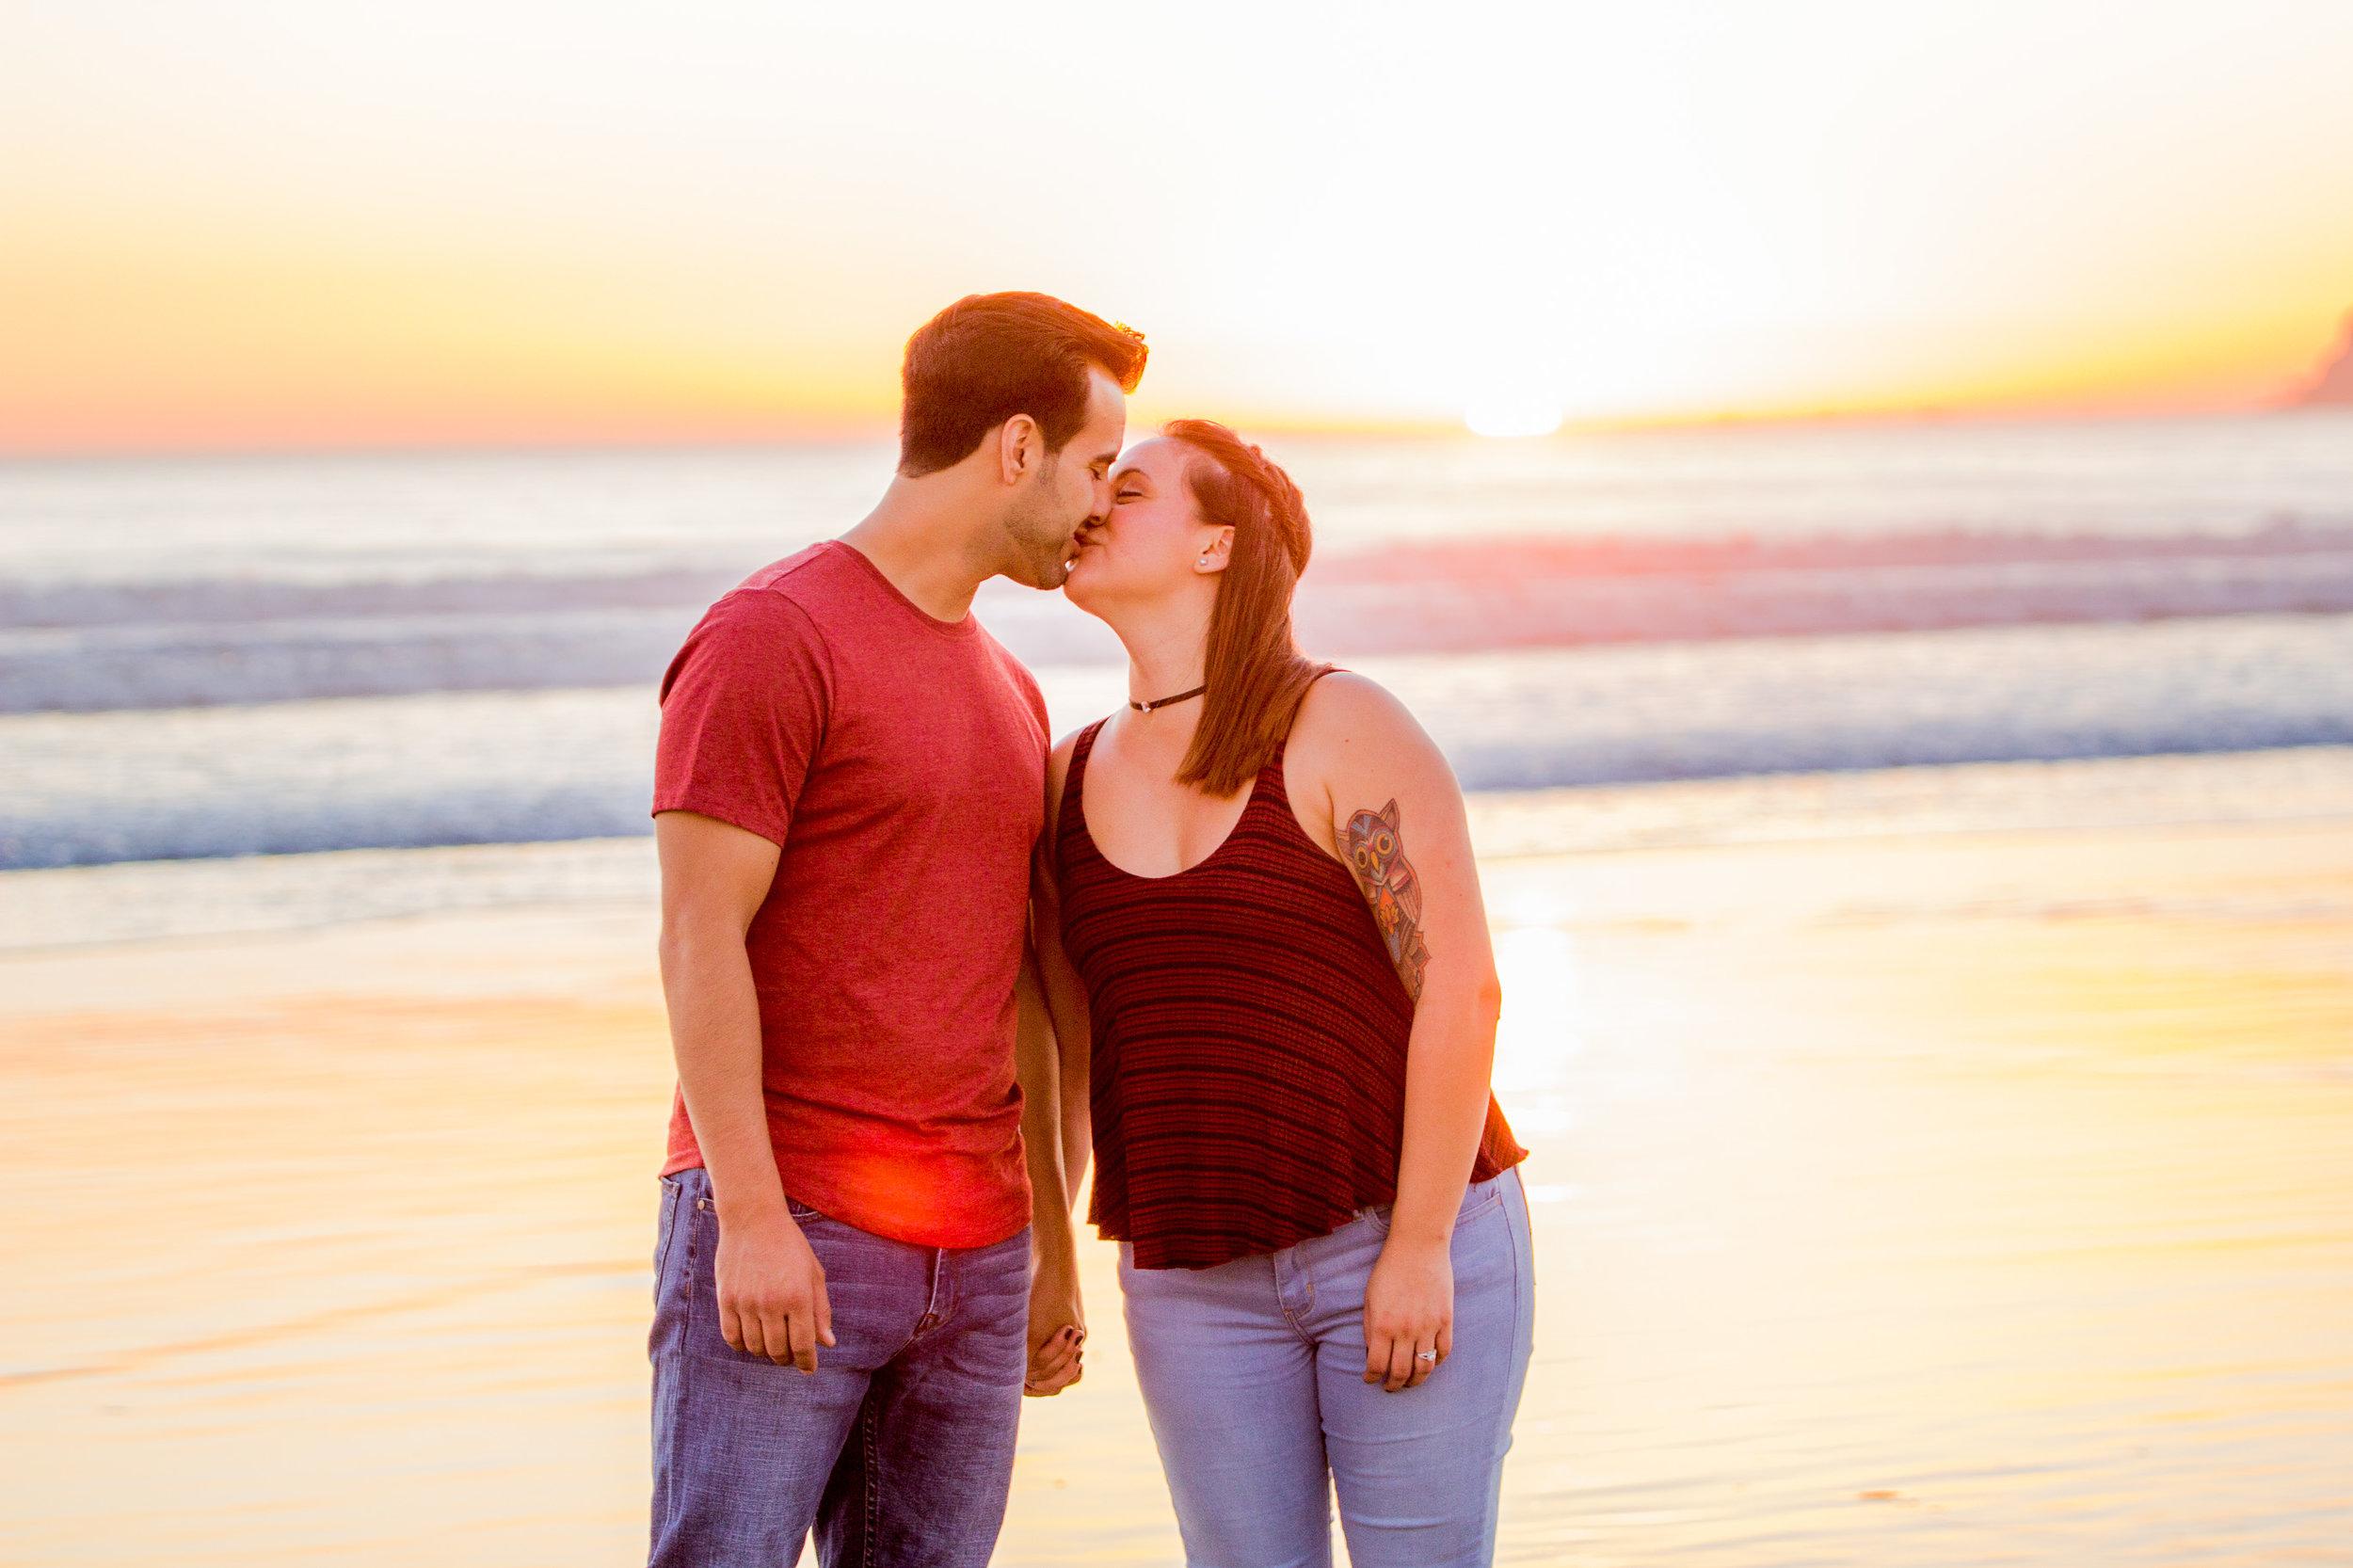 san-diego-sunset-coronado-beach-engagement-photographer-wedding-planning